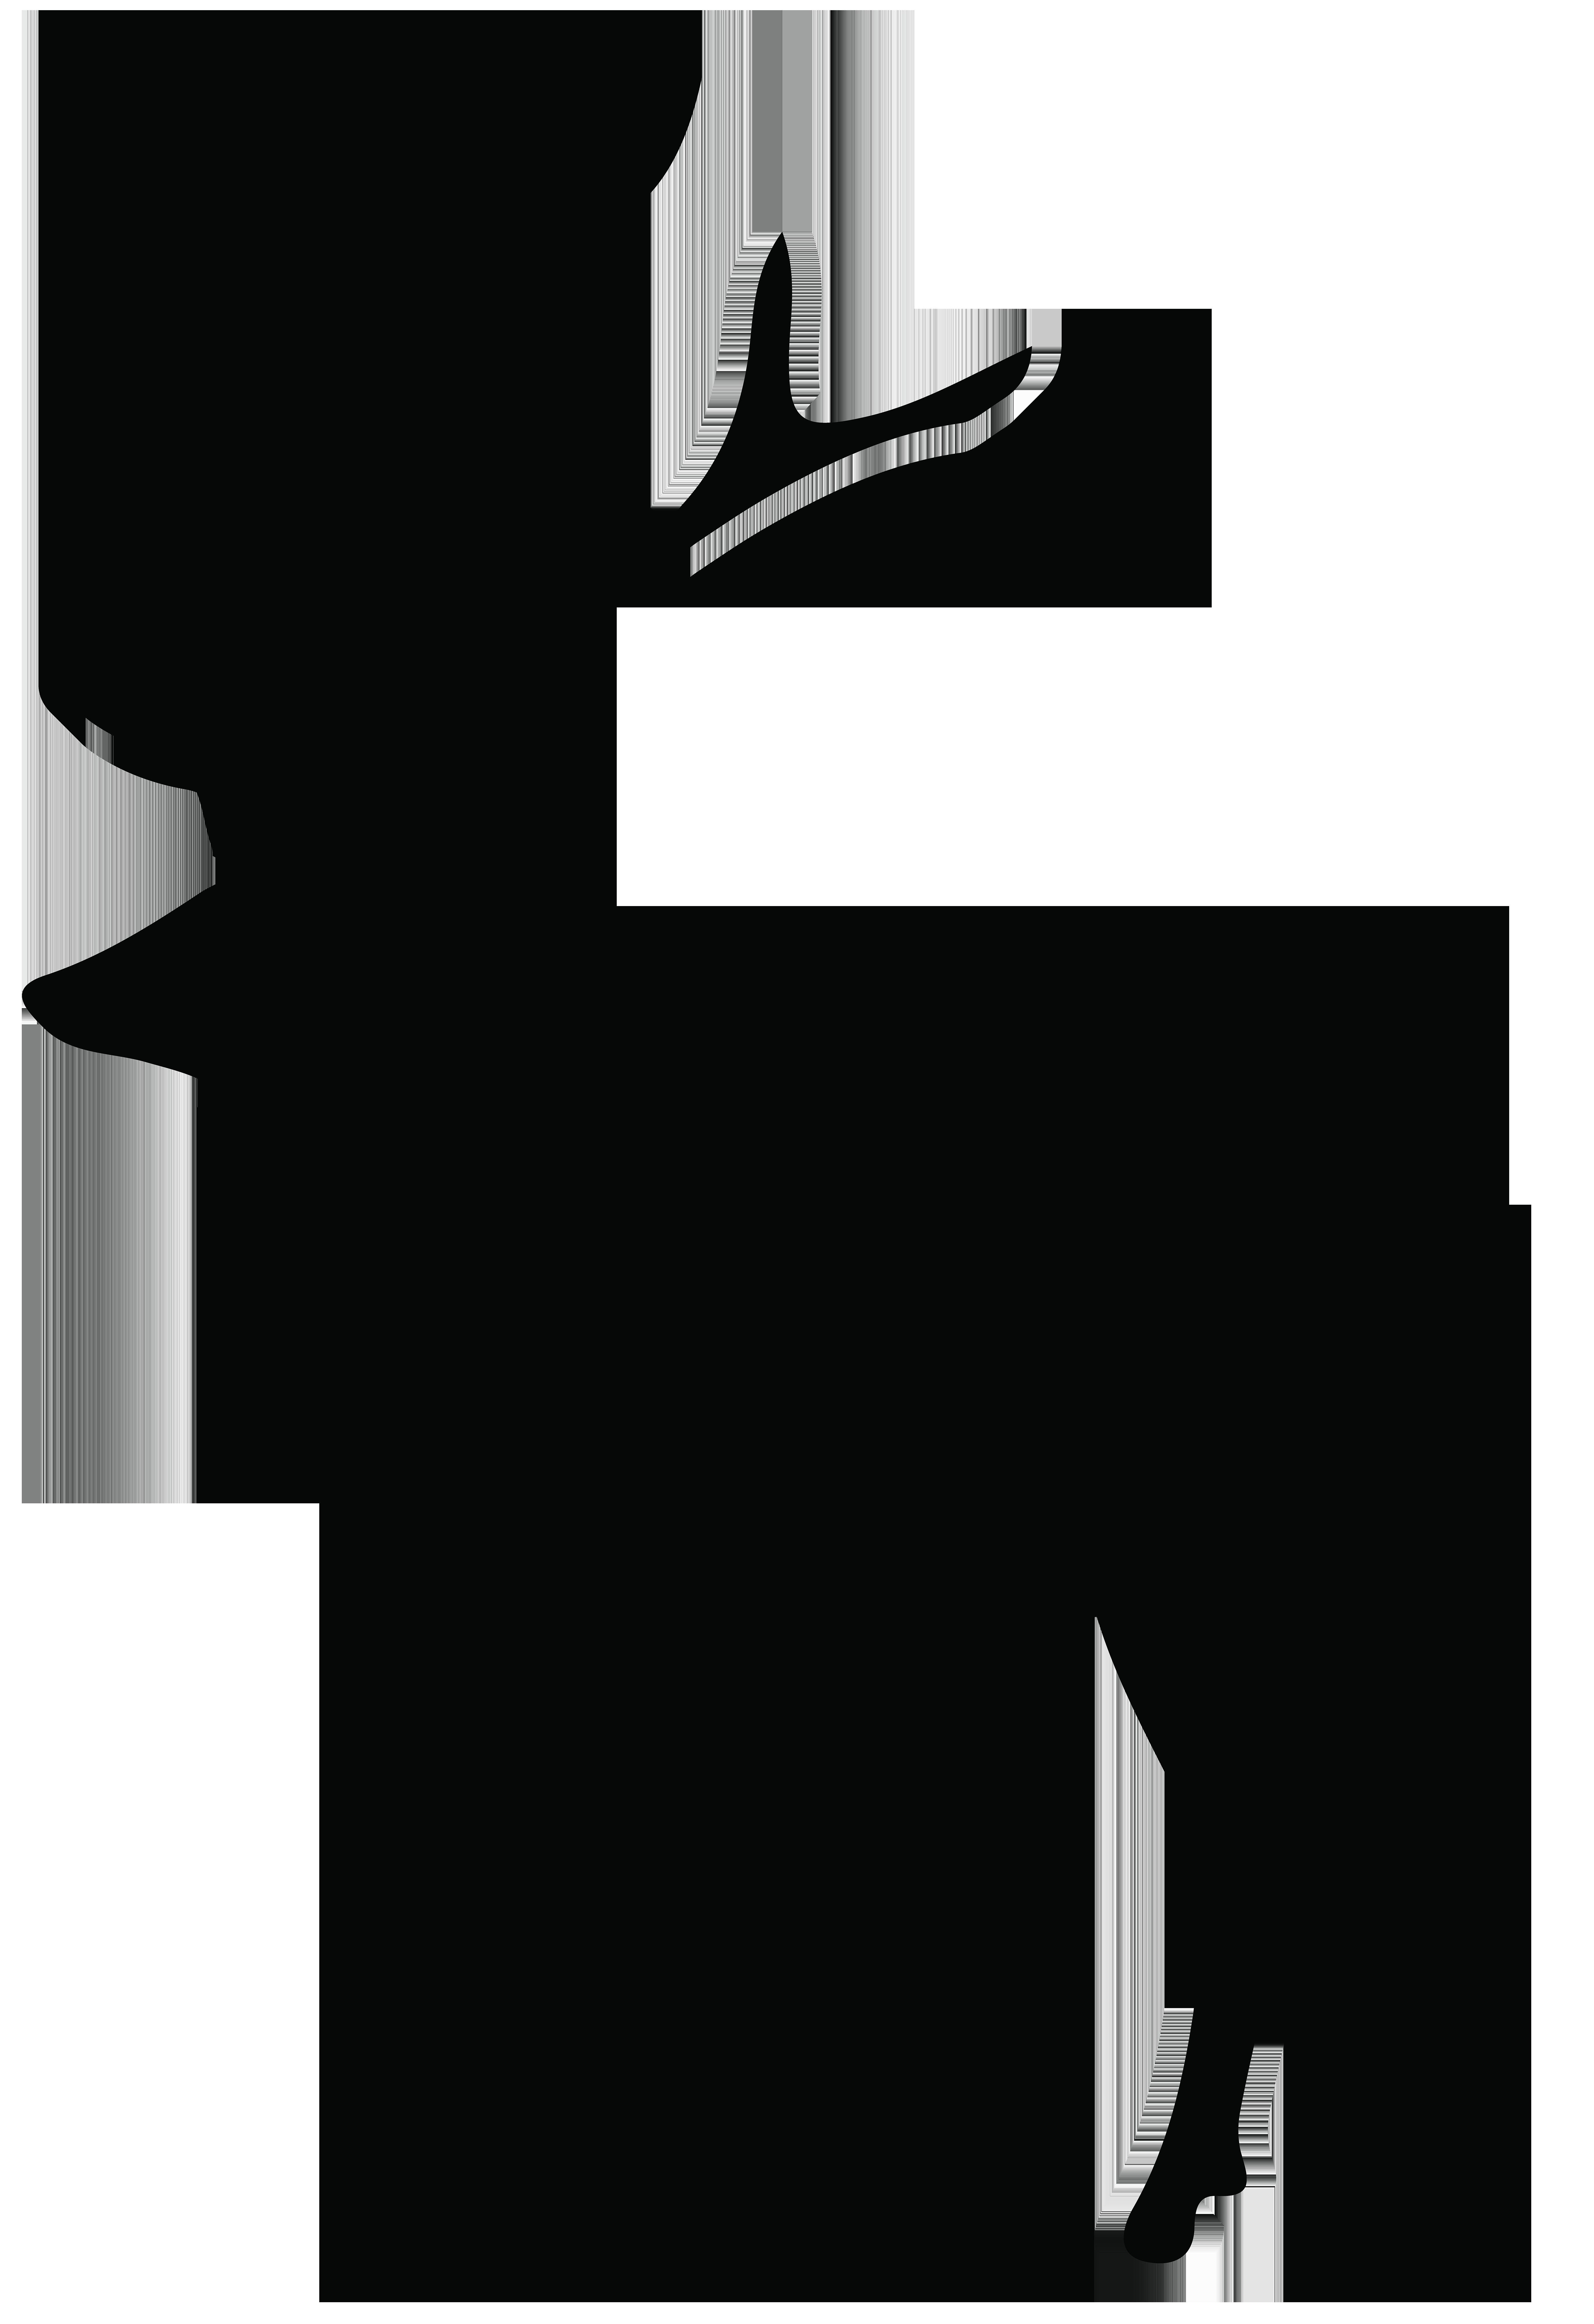 5487x8000 Deer Clipart Transparent Background